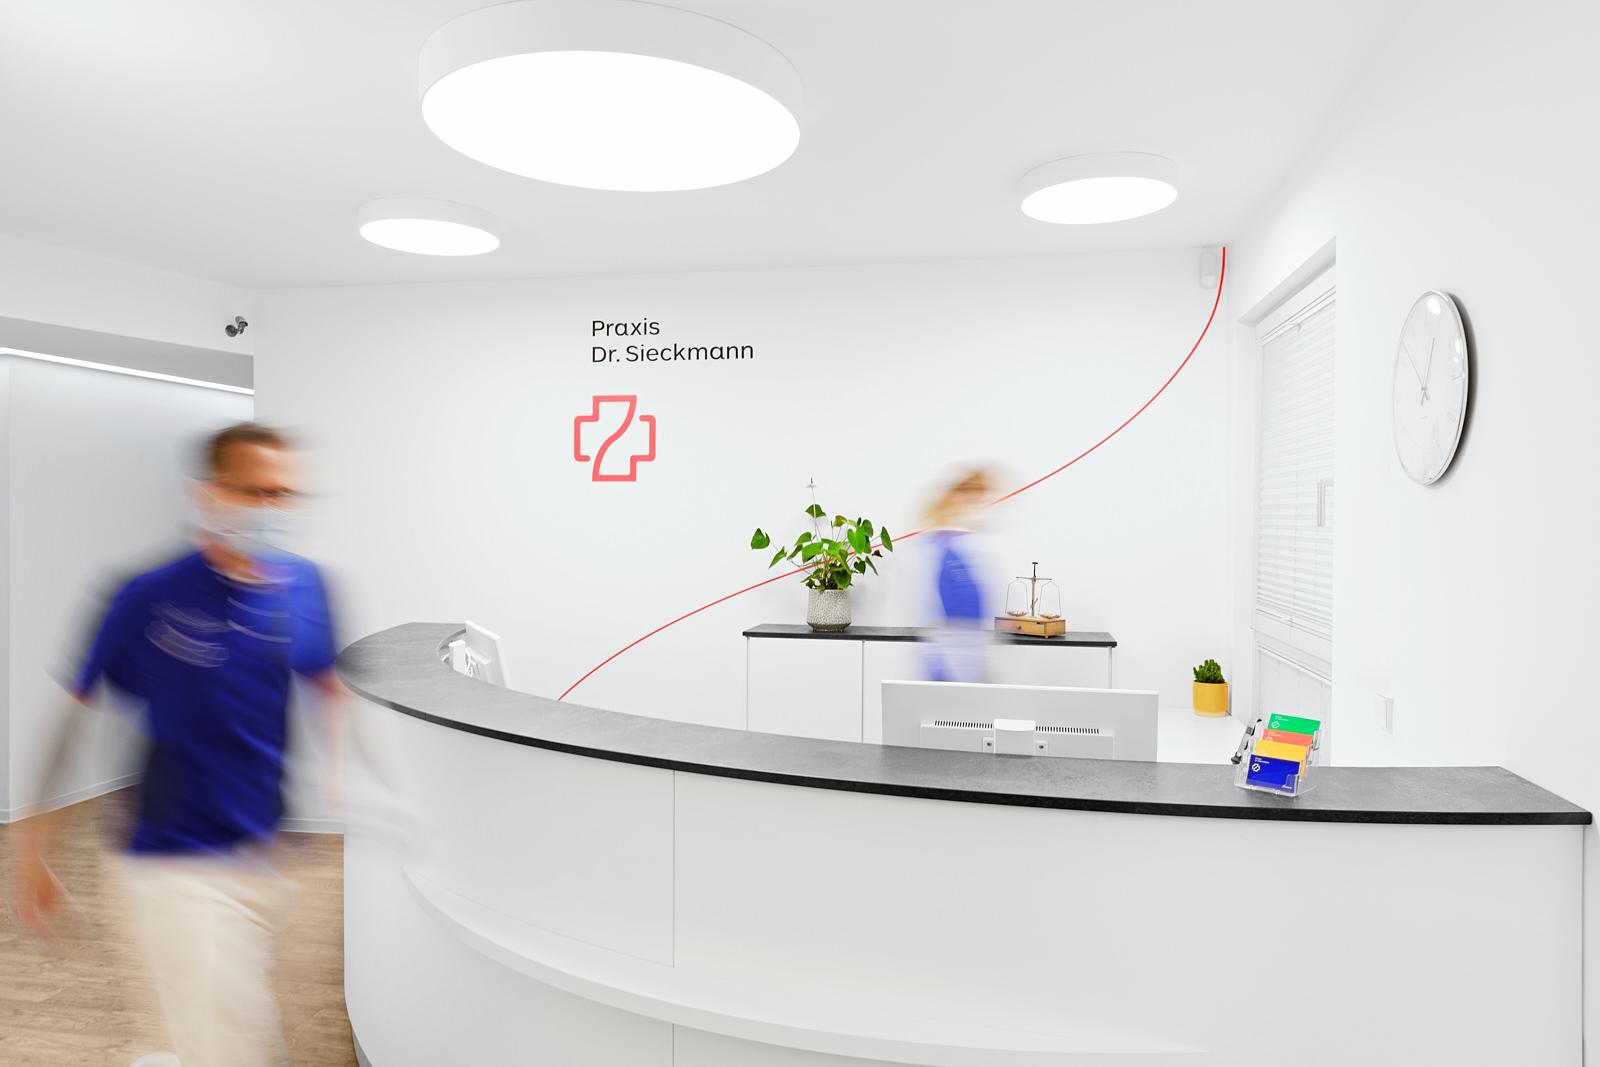 Interior Fotografie, Räume Fotografie, Berlin, Fotograf, Fotografin, Zahnarztpraxis, Healthcare, Medizin, Medizin Fotografie, Gesundheit